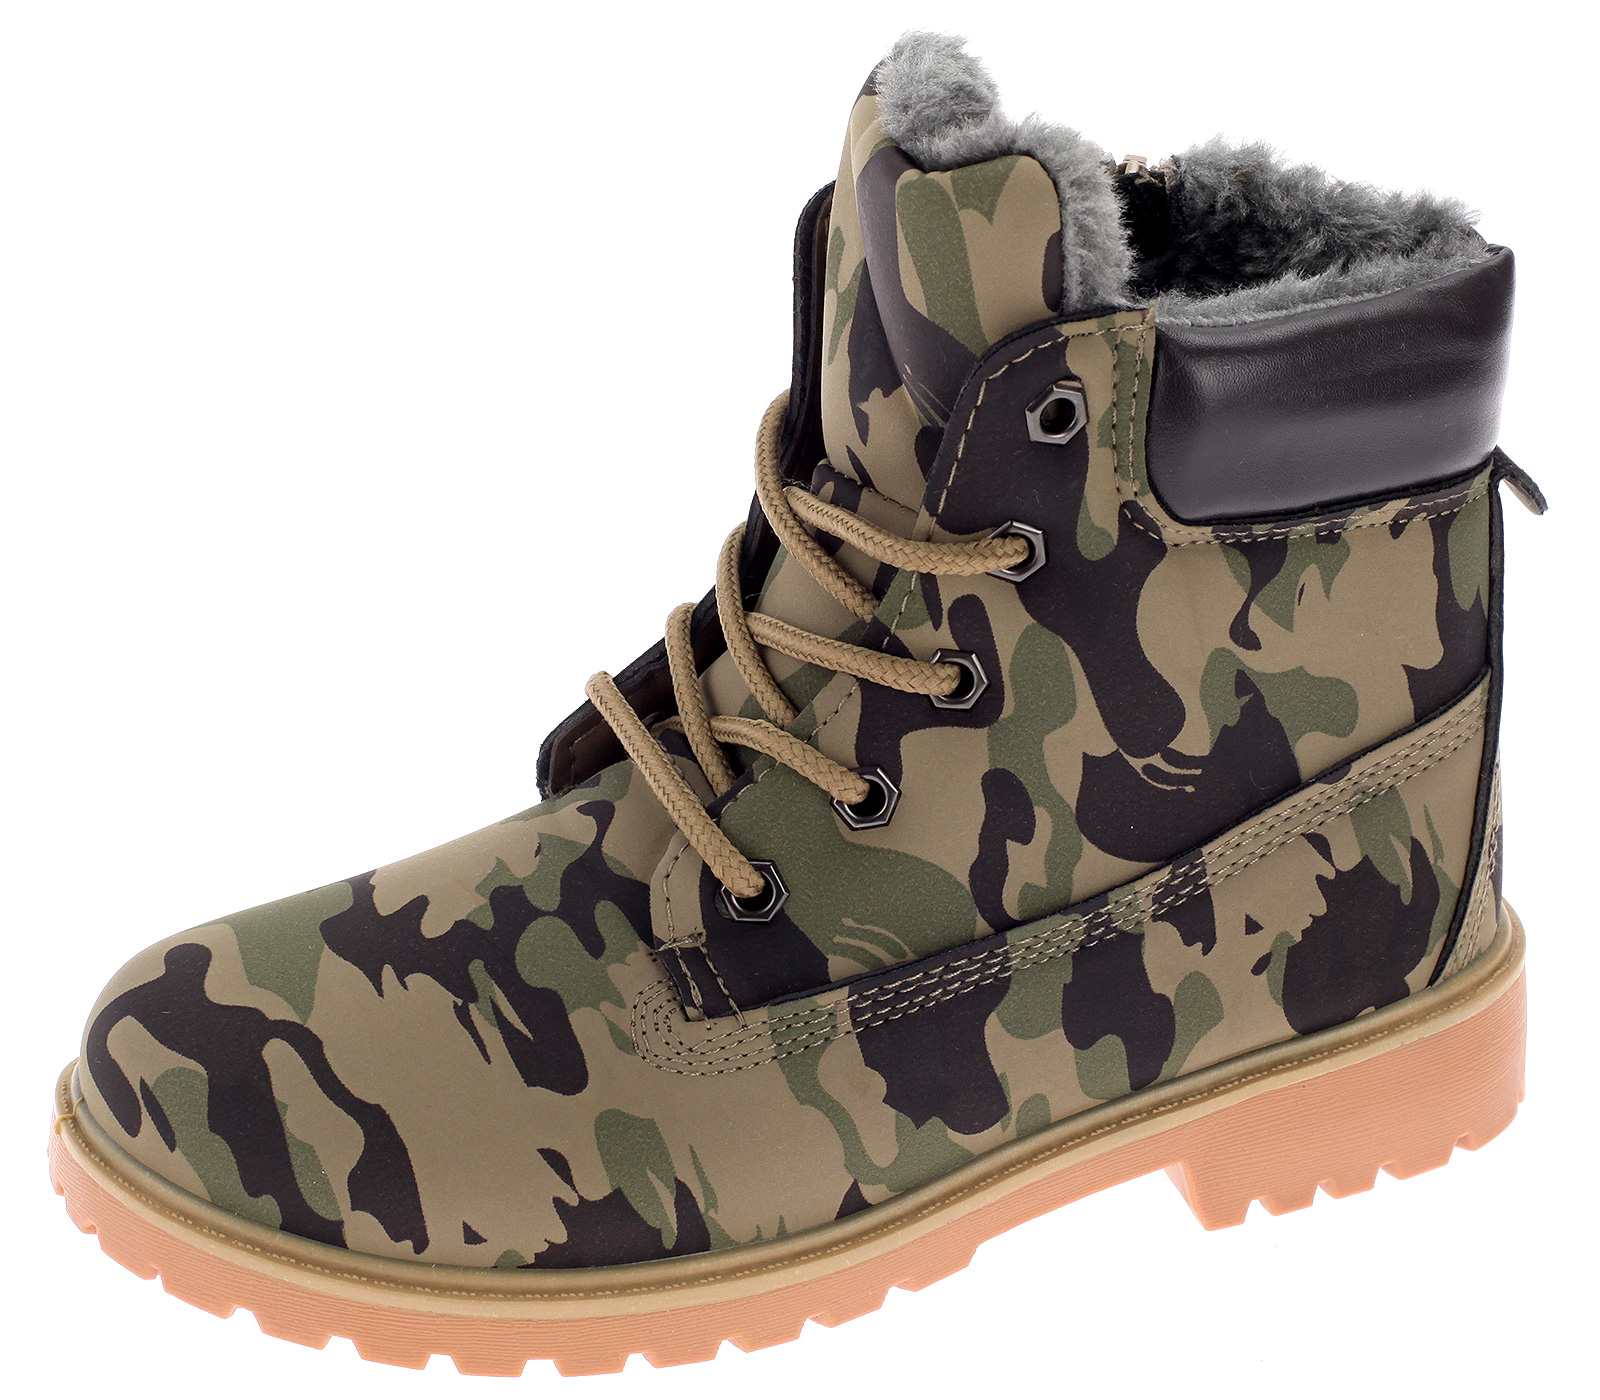 Kinder Boots Stiefel Stiefeletten Winterboots Gefütterte Army Kinderschuhe Khaki 3138-3